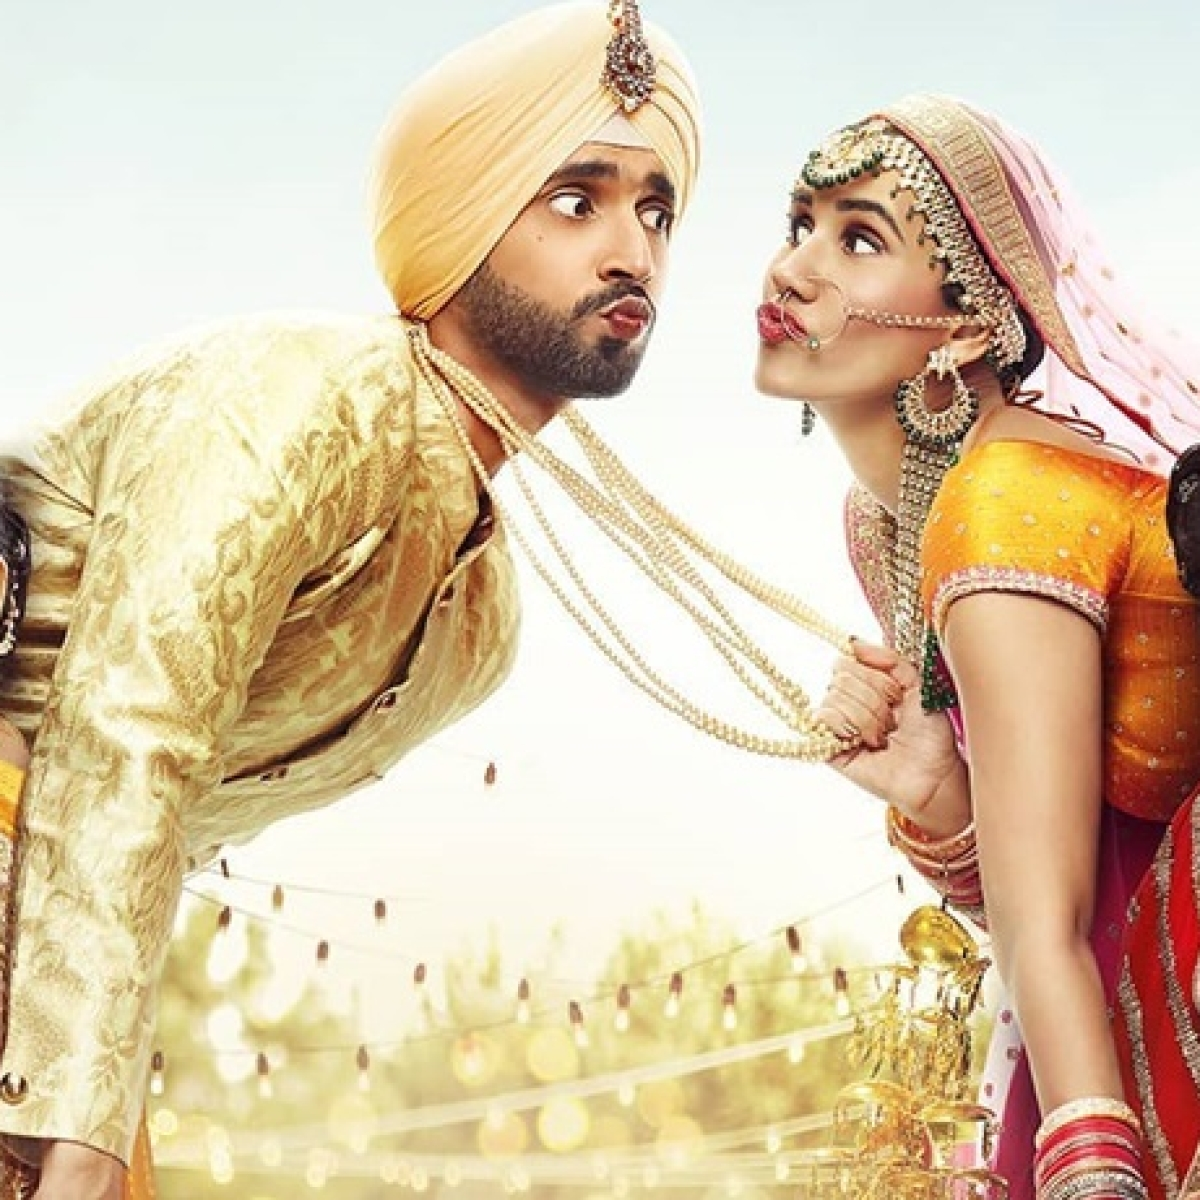 Jai Mummy Di: Sunny Singh, Sonnalli Seygall to star in Luv Ranjan's quirky comedy